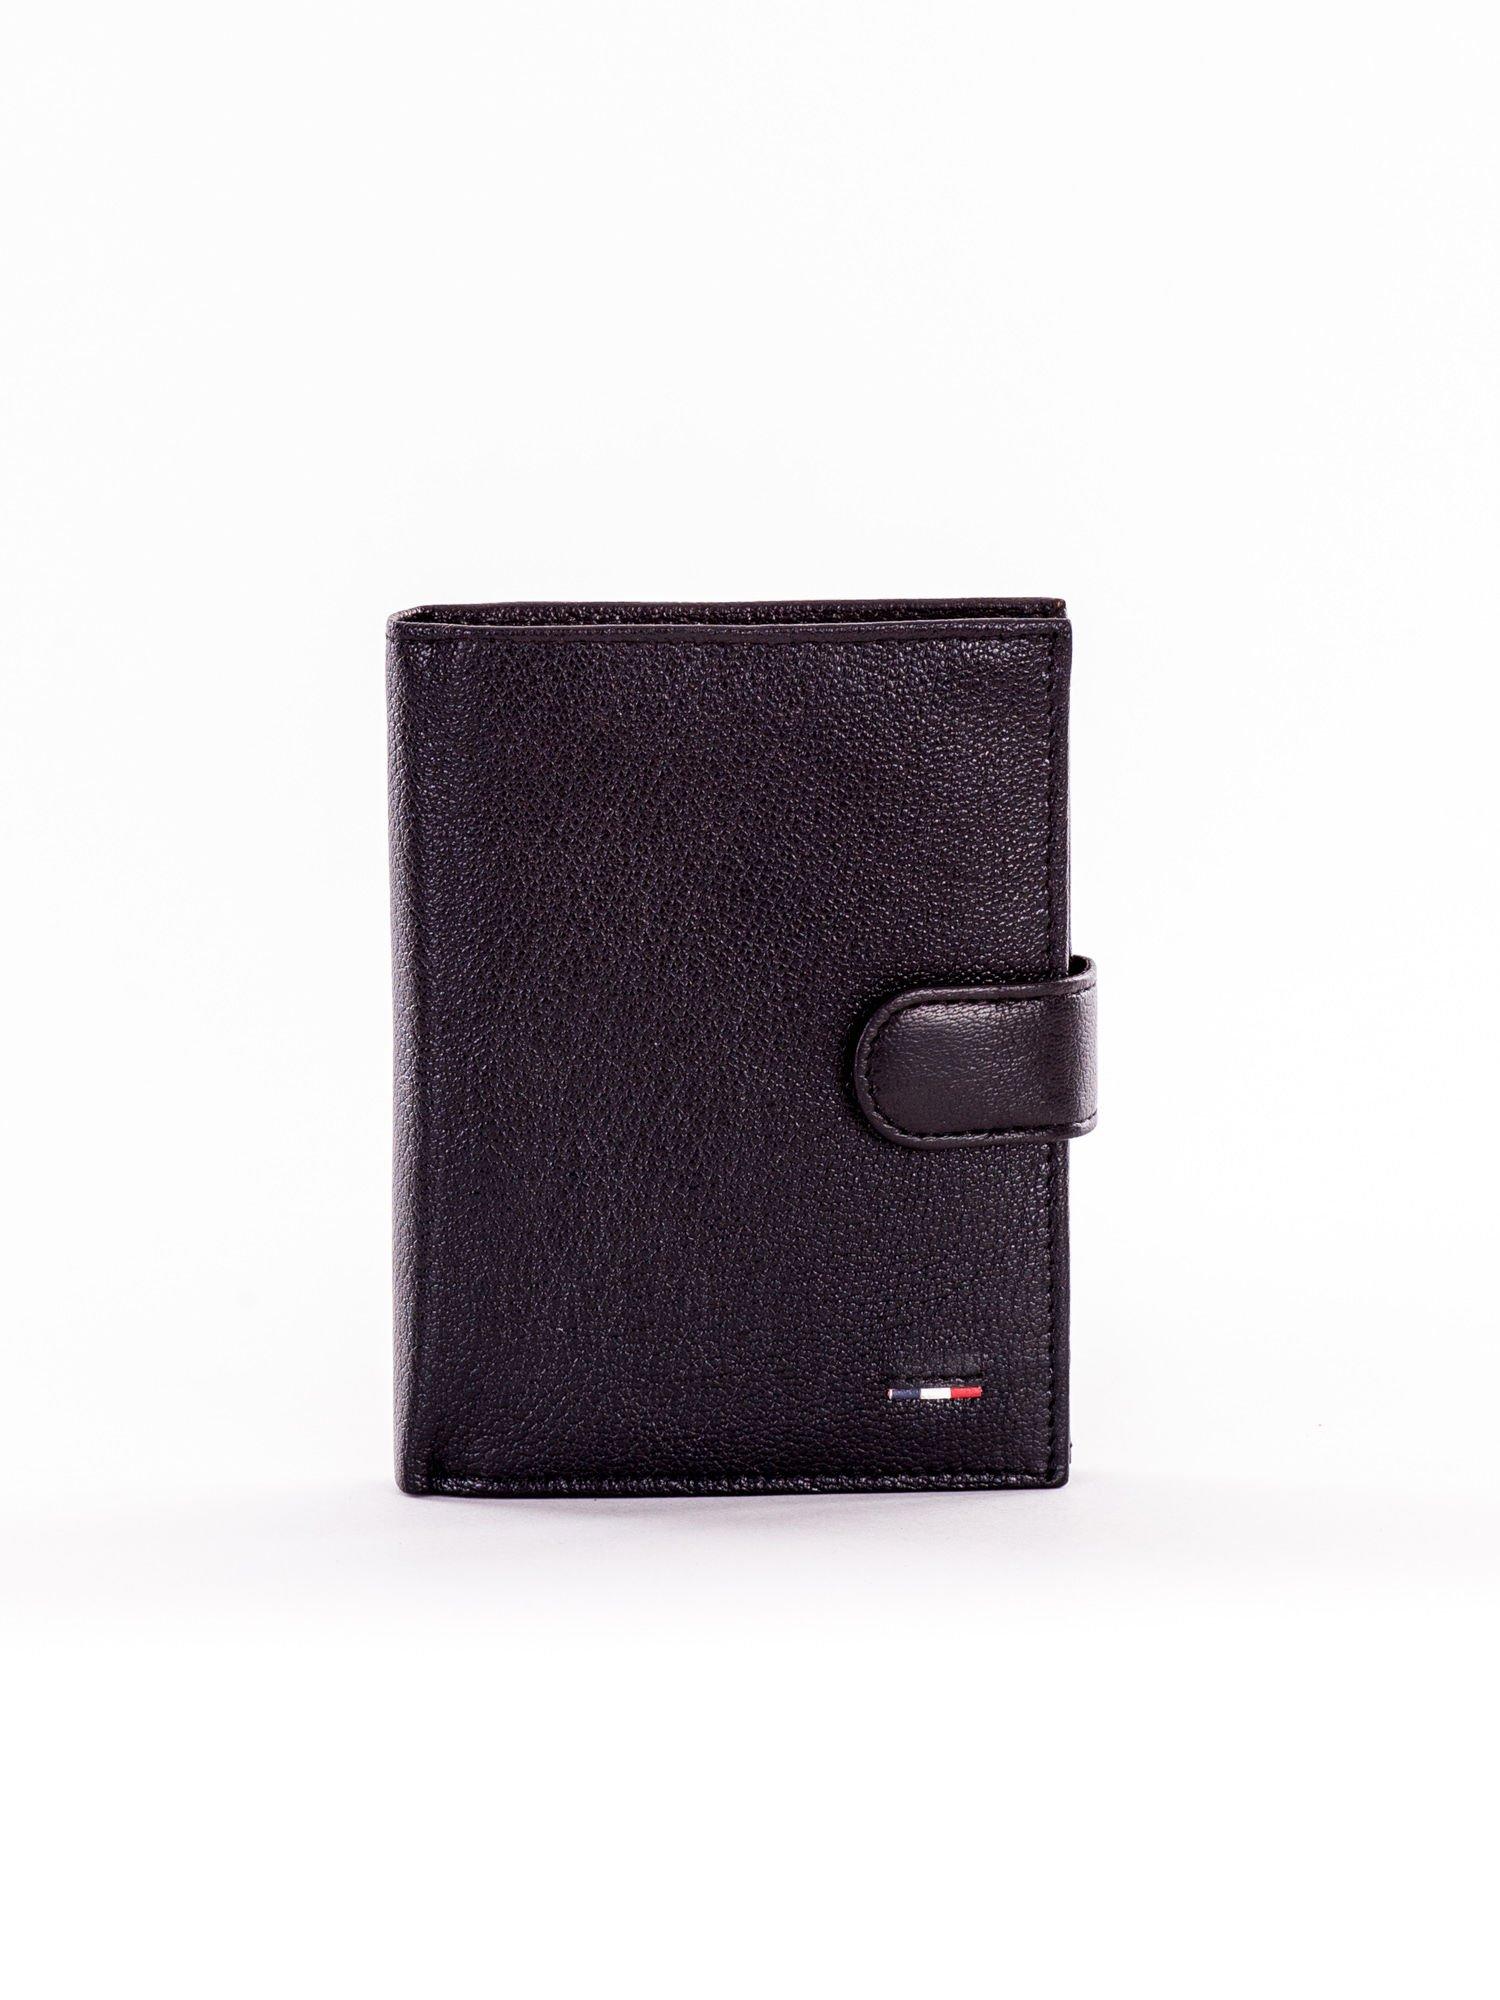 e169bdf0c2ceb Czarny skórzany portfel zapinany na napę - Mężczyźni portfel męski ...